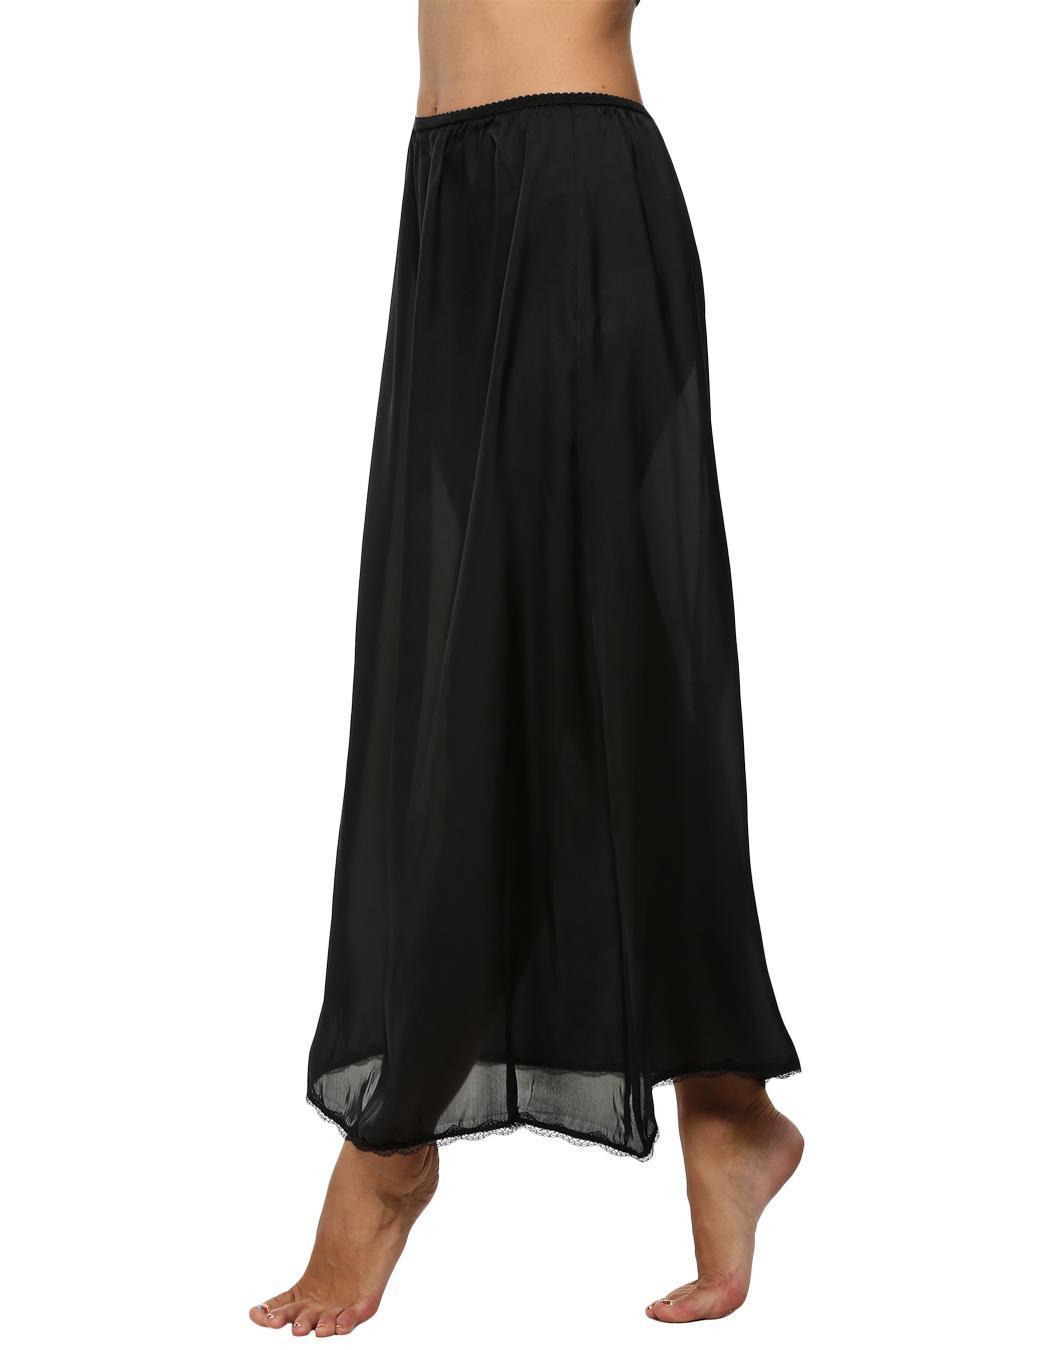 Women Satin Solid Lace Trim Maxi Half Slip Underskirt Slip Skirt 1